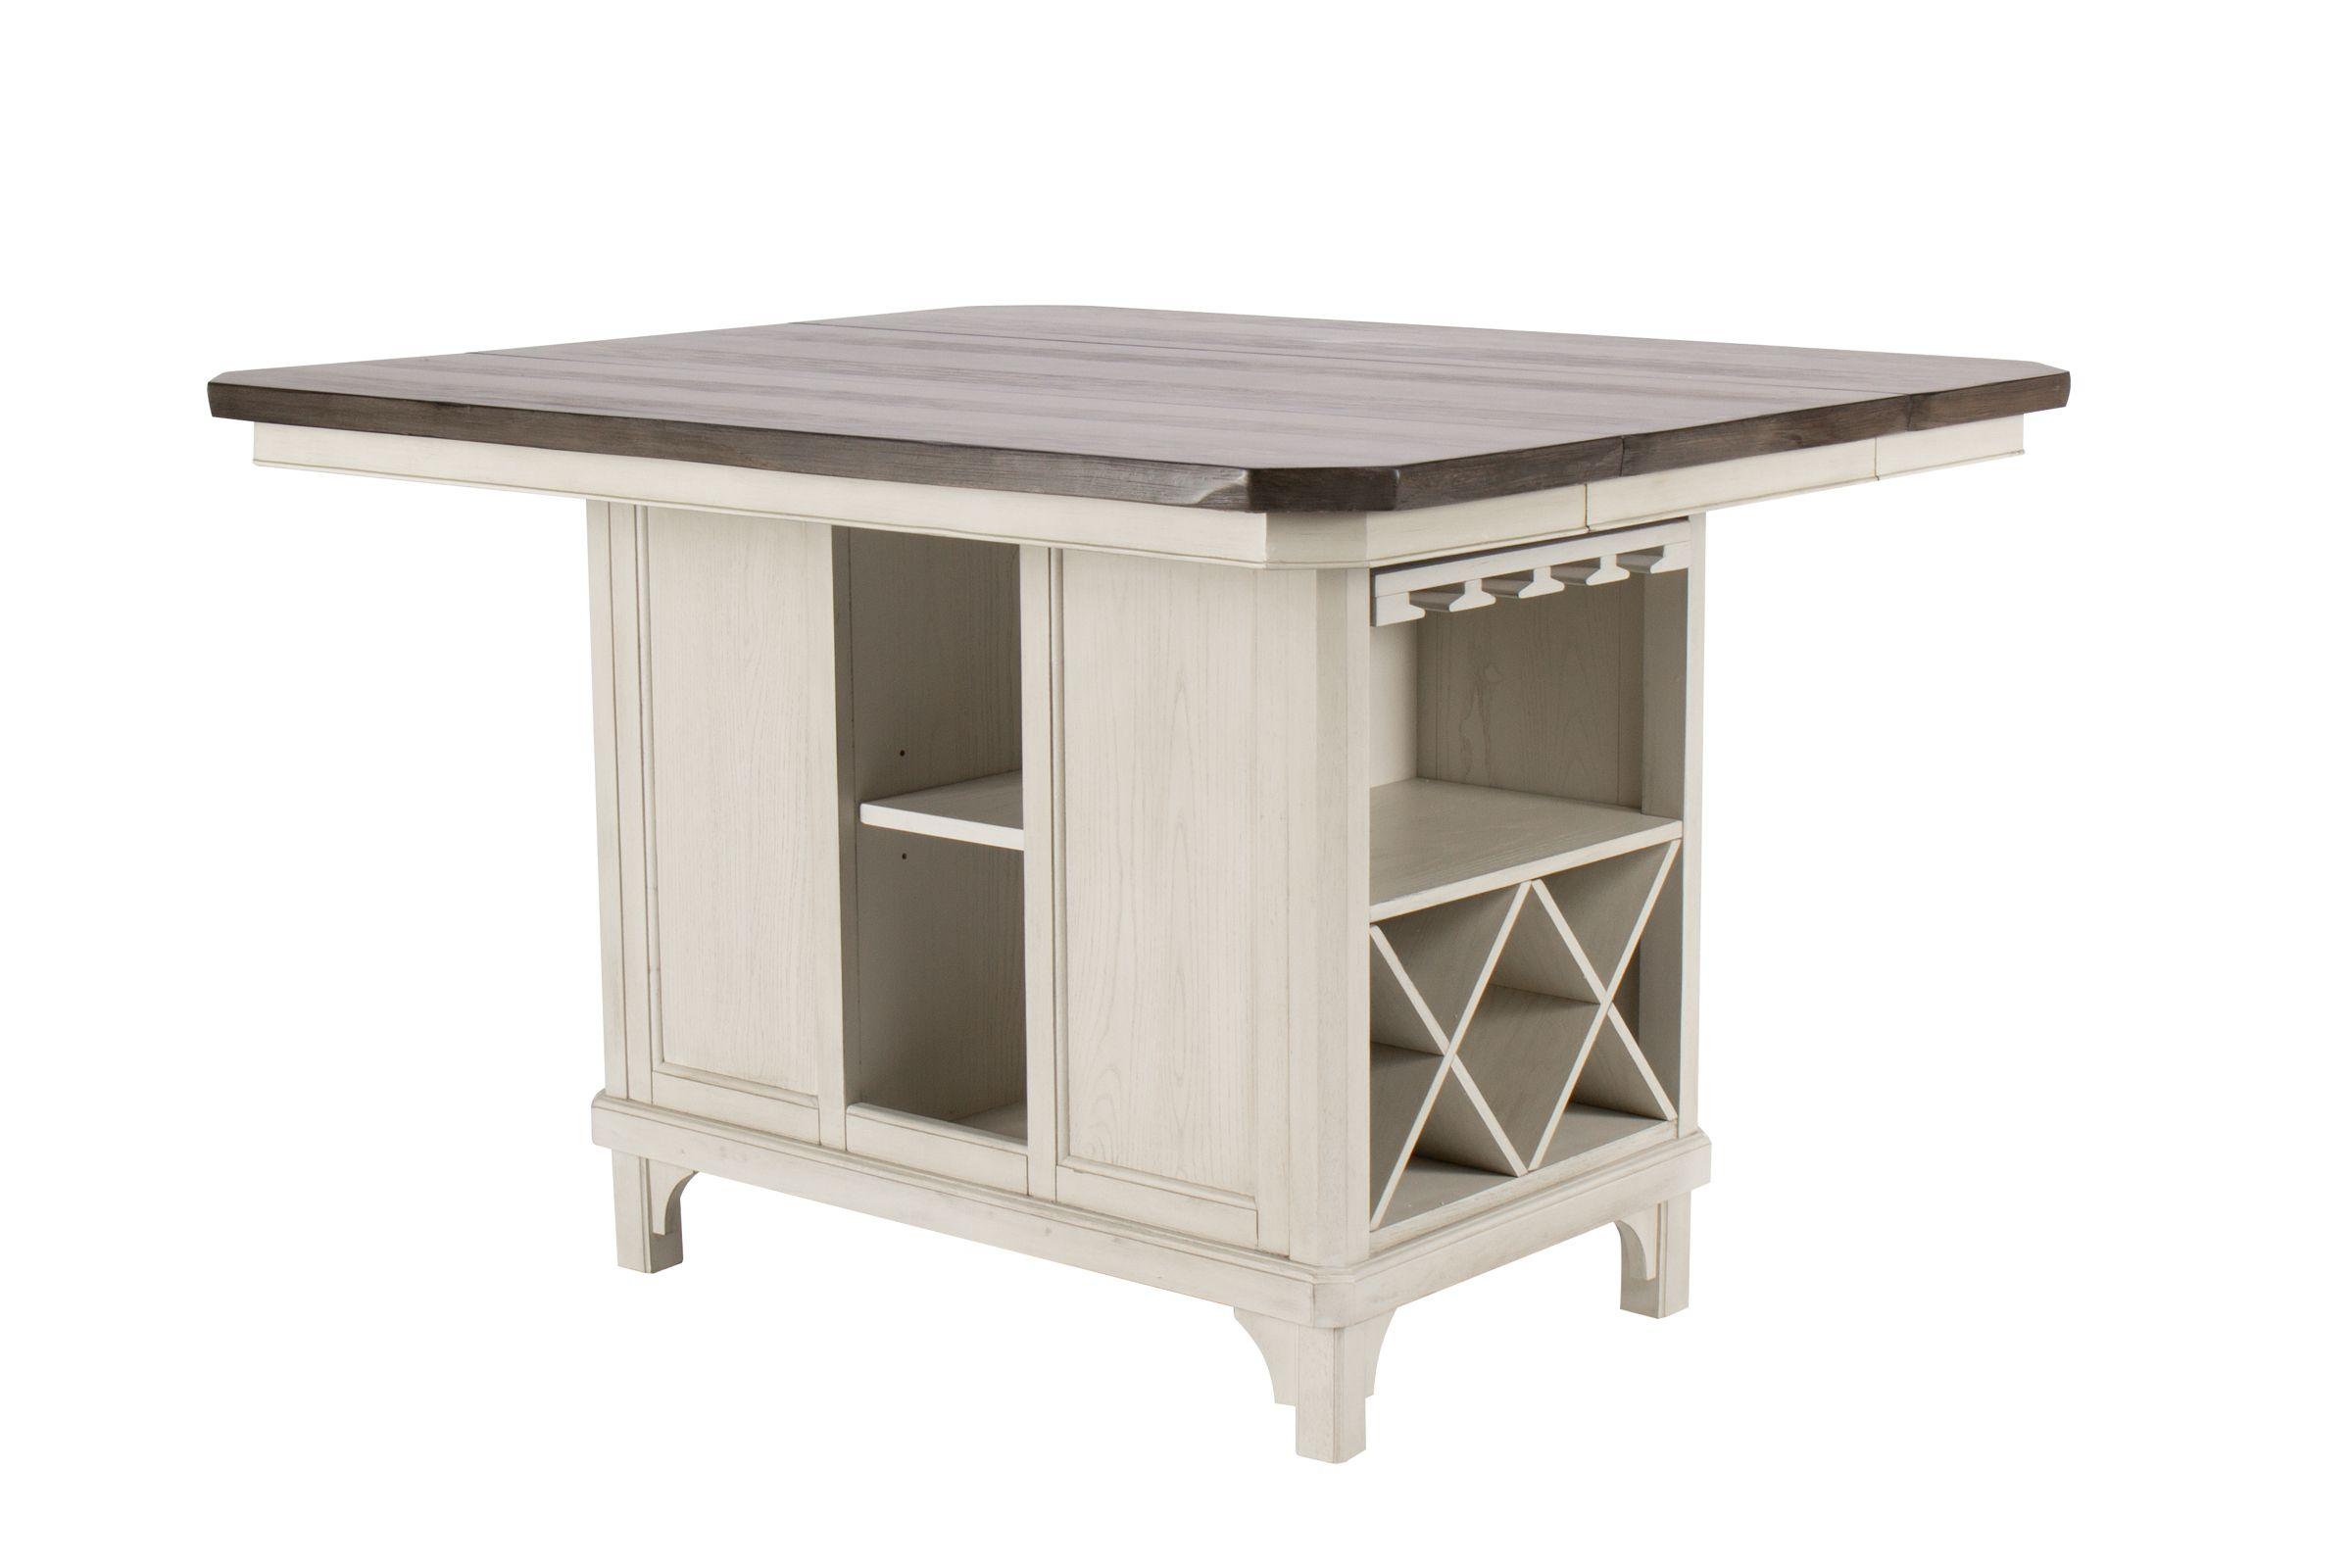 Mystic Kitchen Island Table At Gardner White